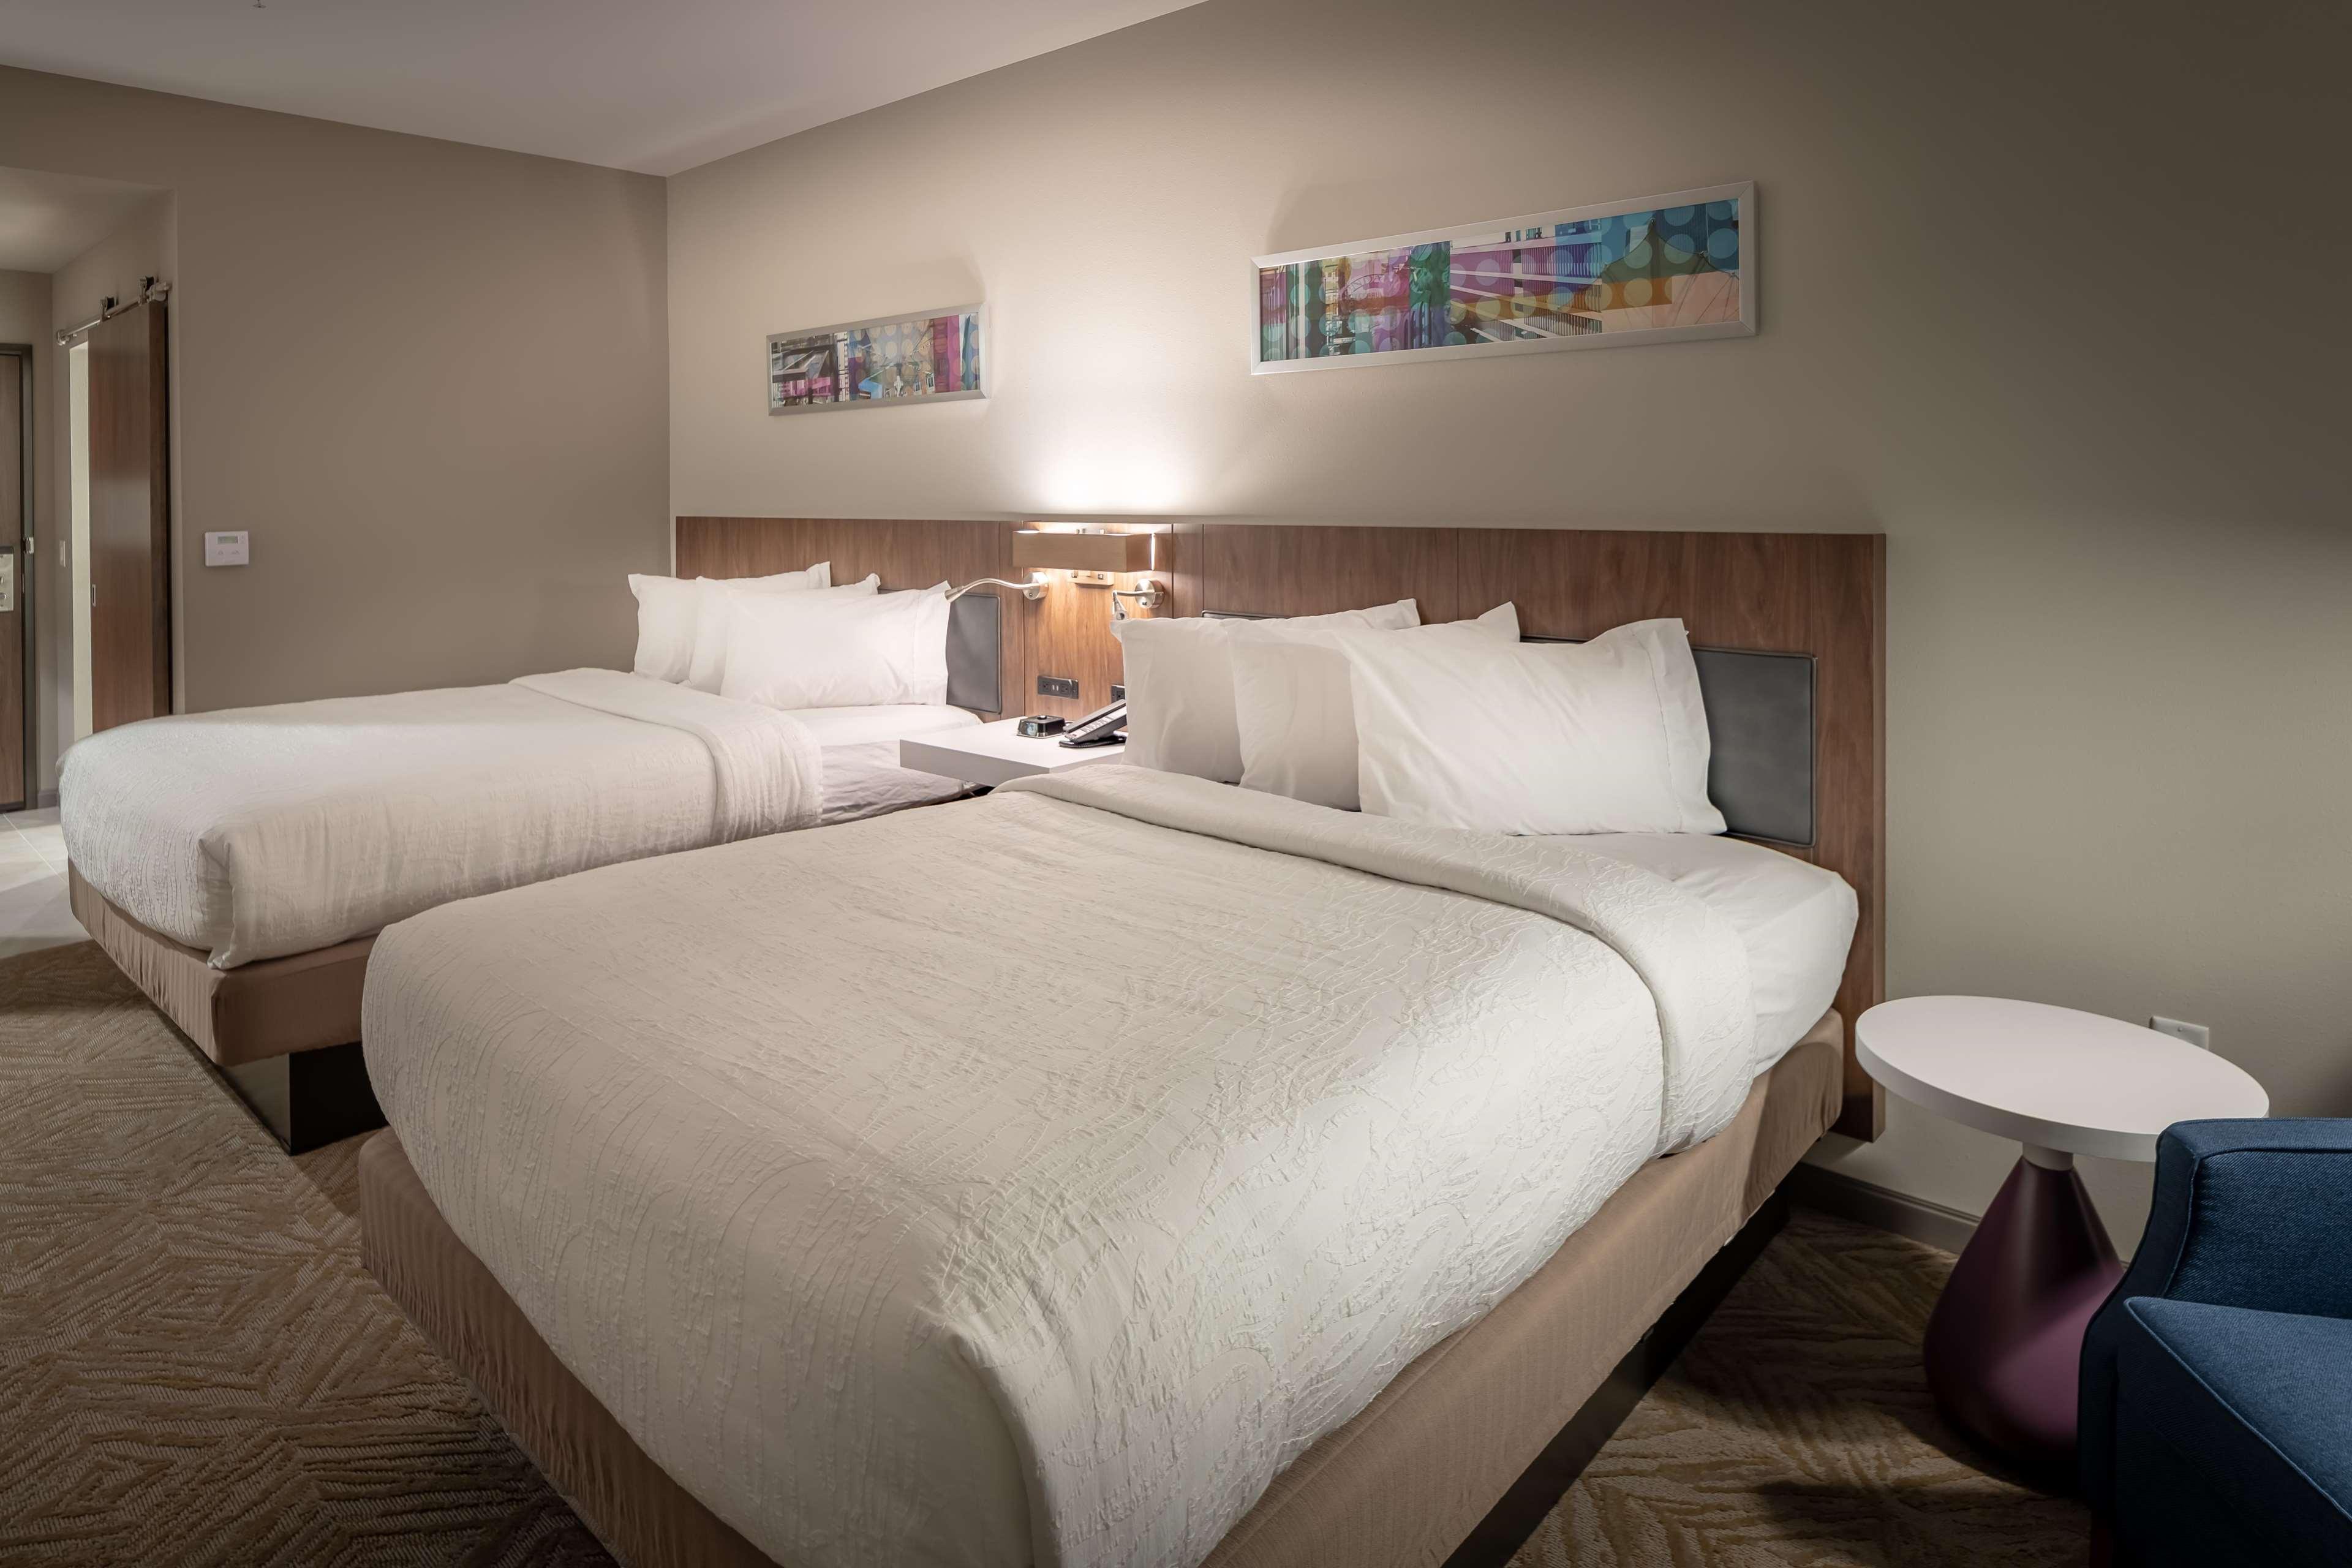 Hilton Garden Inn Dallas at Hurst Conference Center image 26